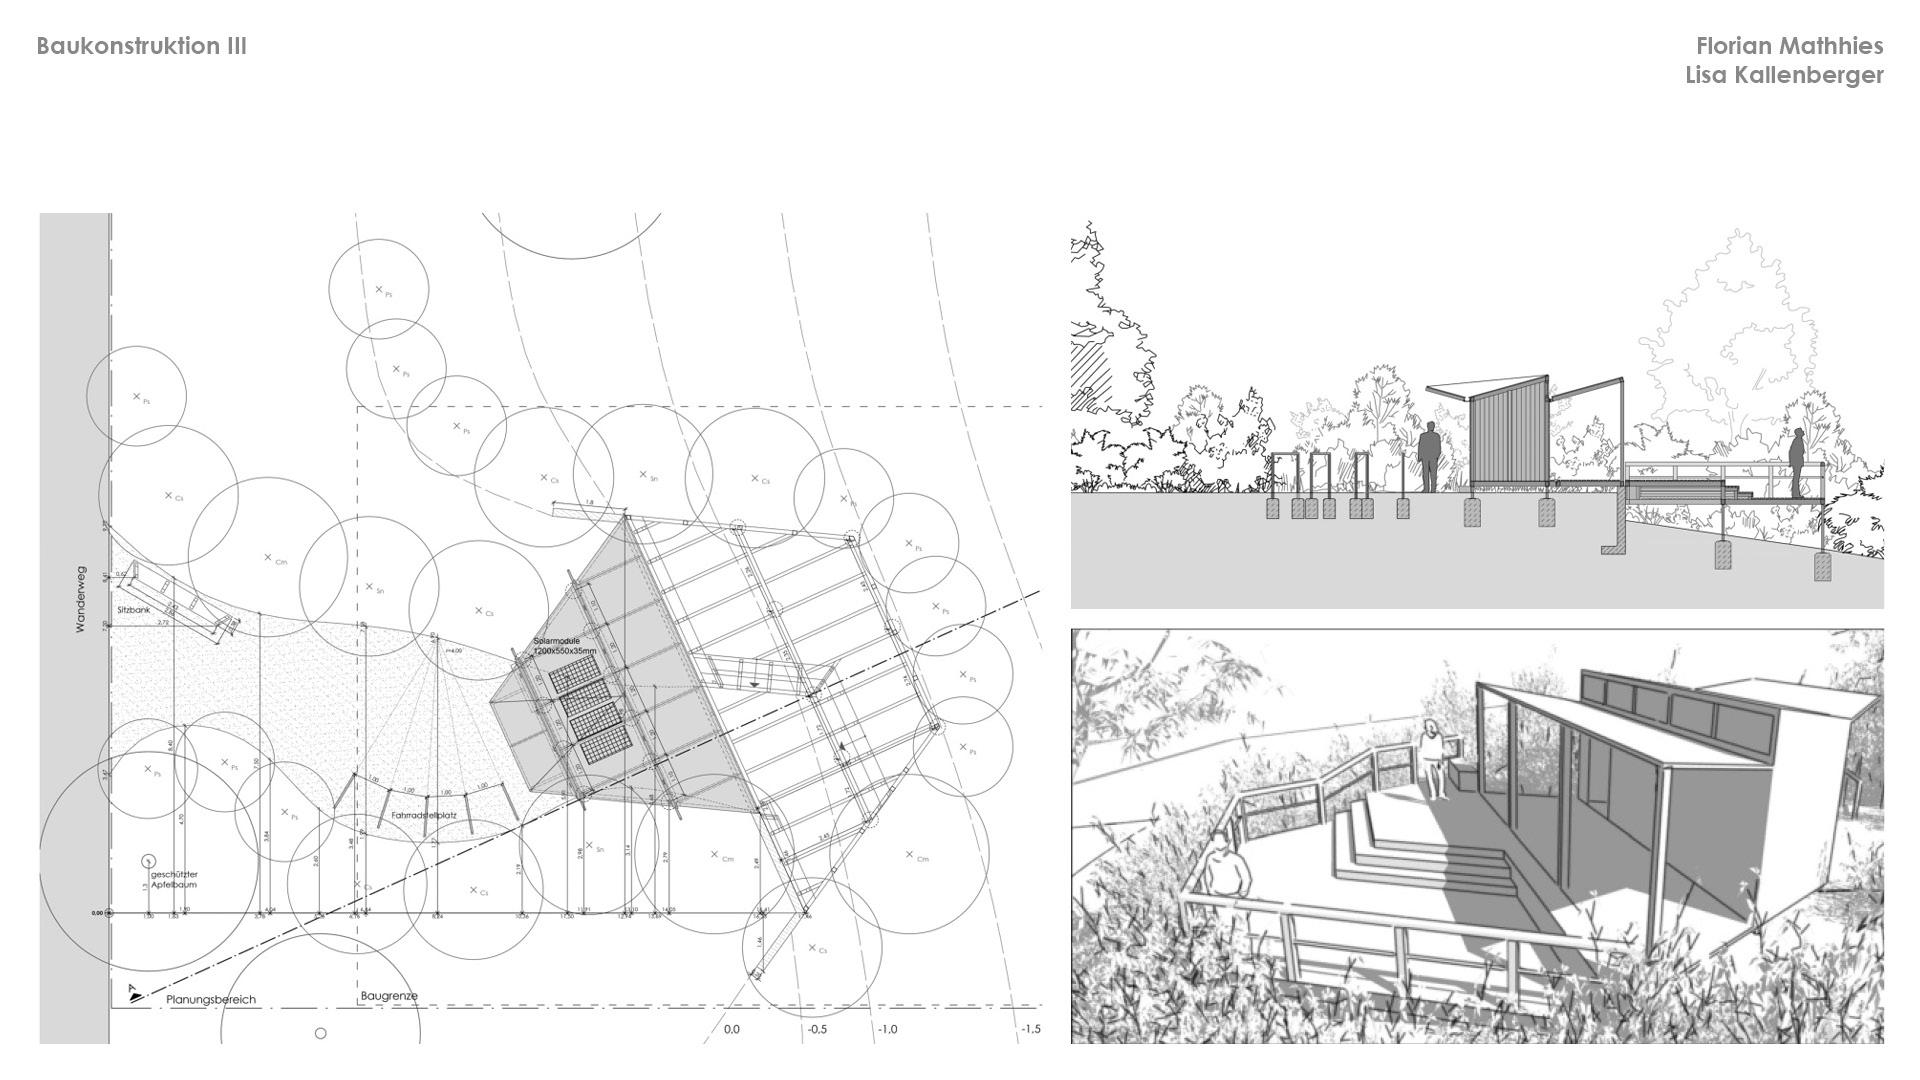 03 2013 3 BaukonstruktionIII